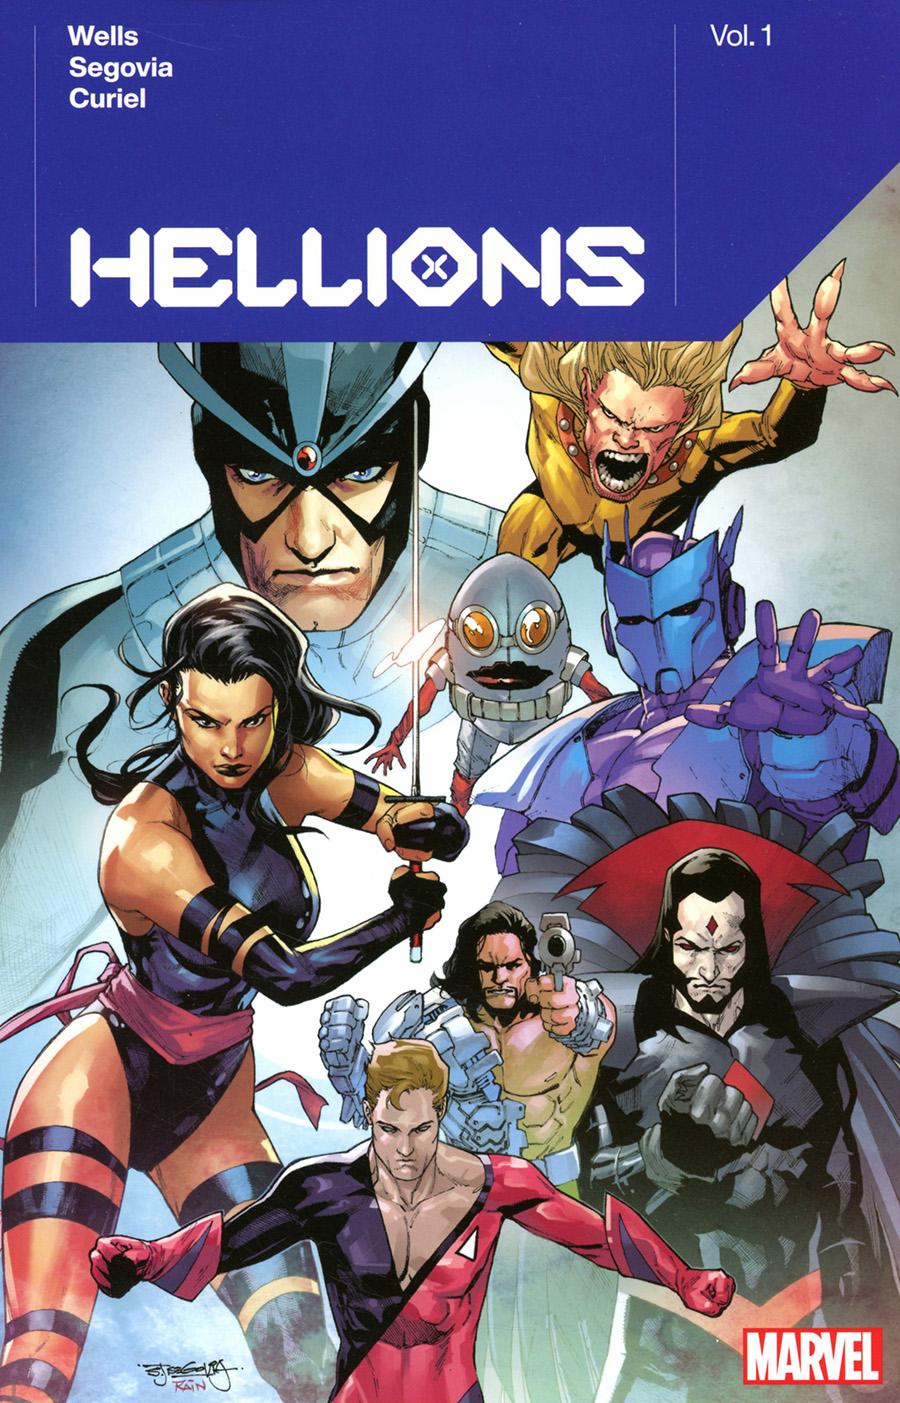 Hellions By Zeb Wells Vol 1 TP